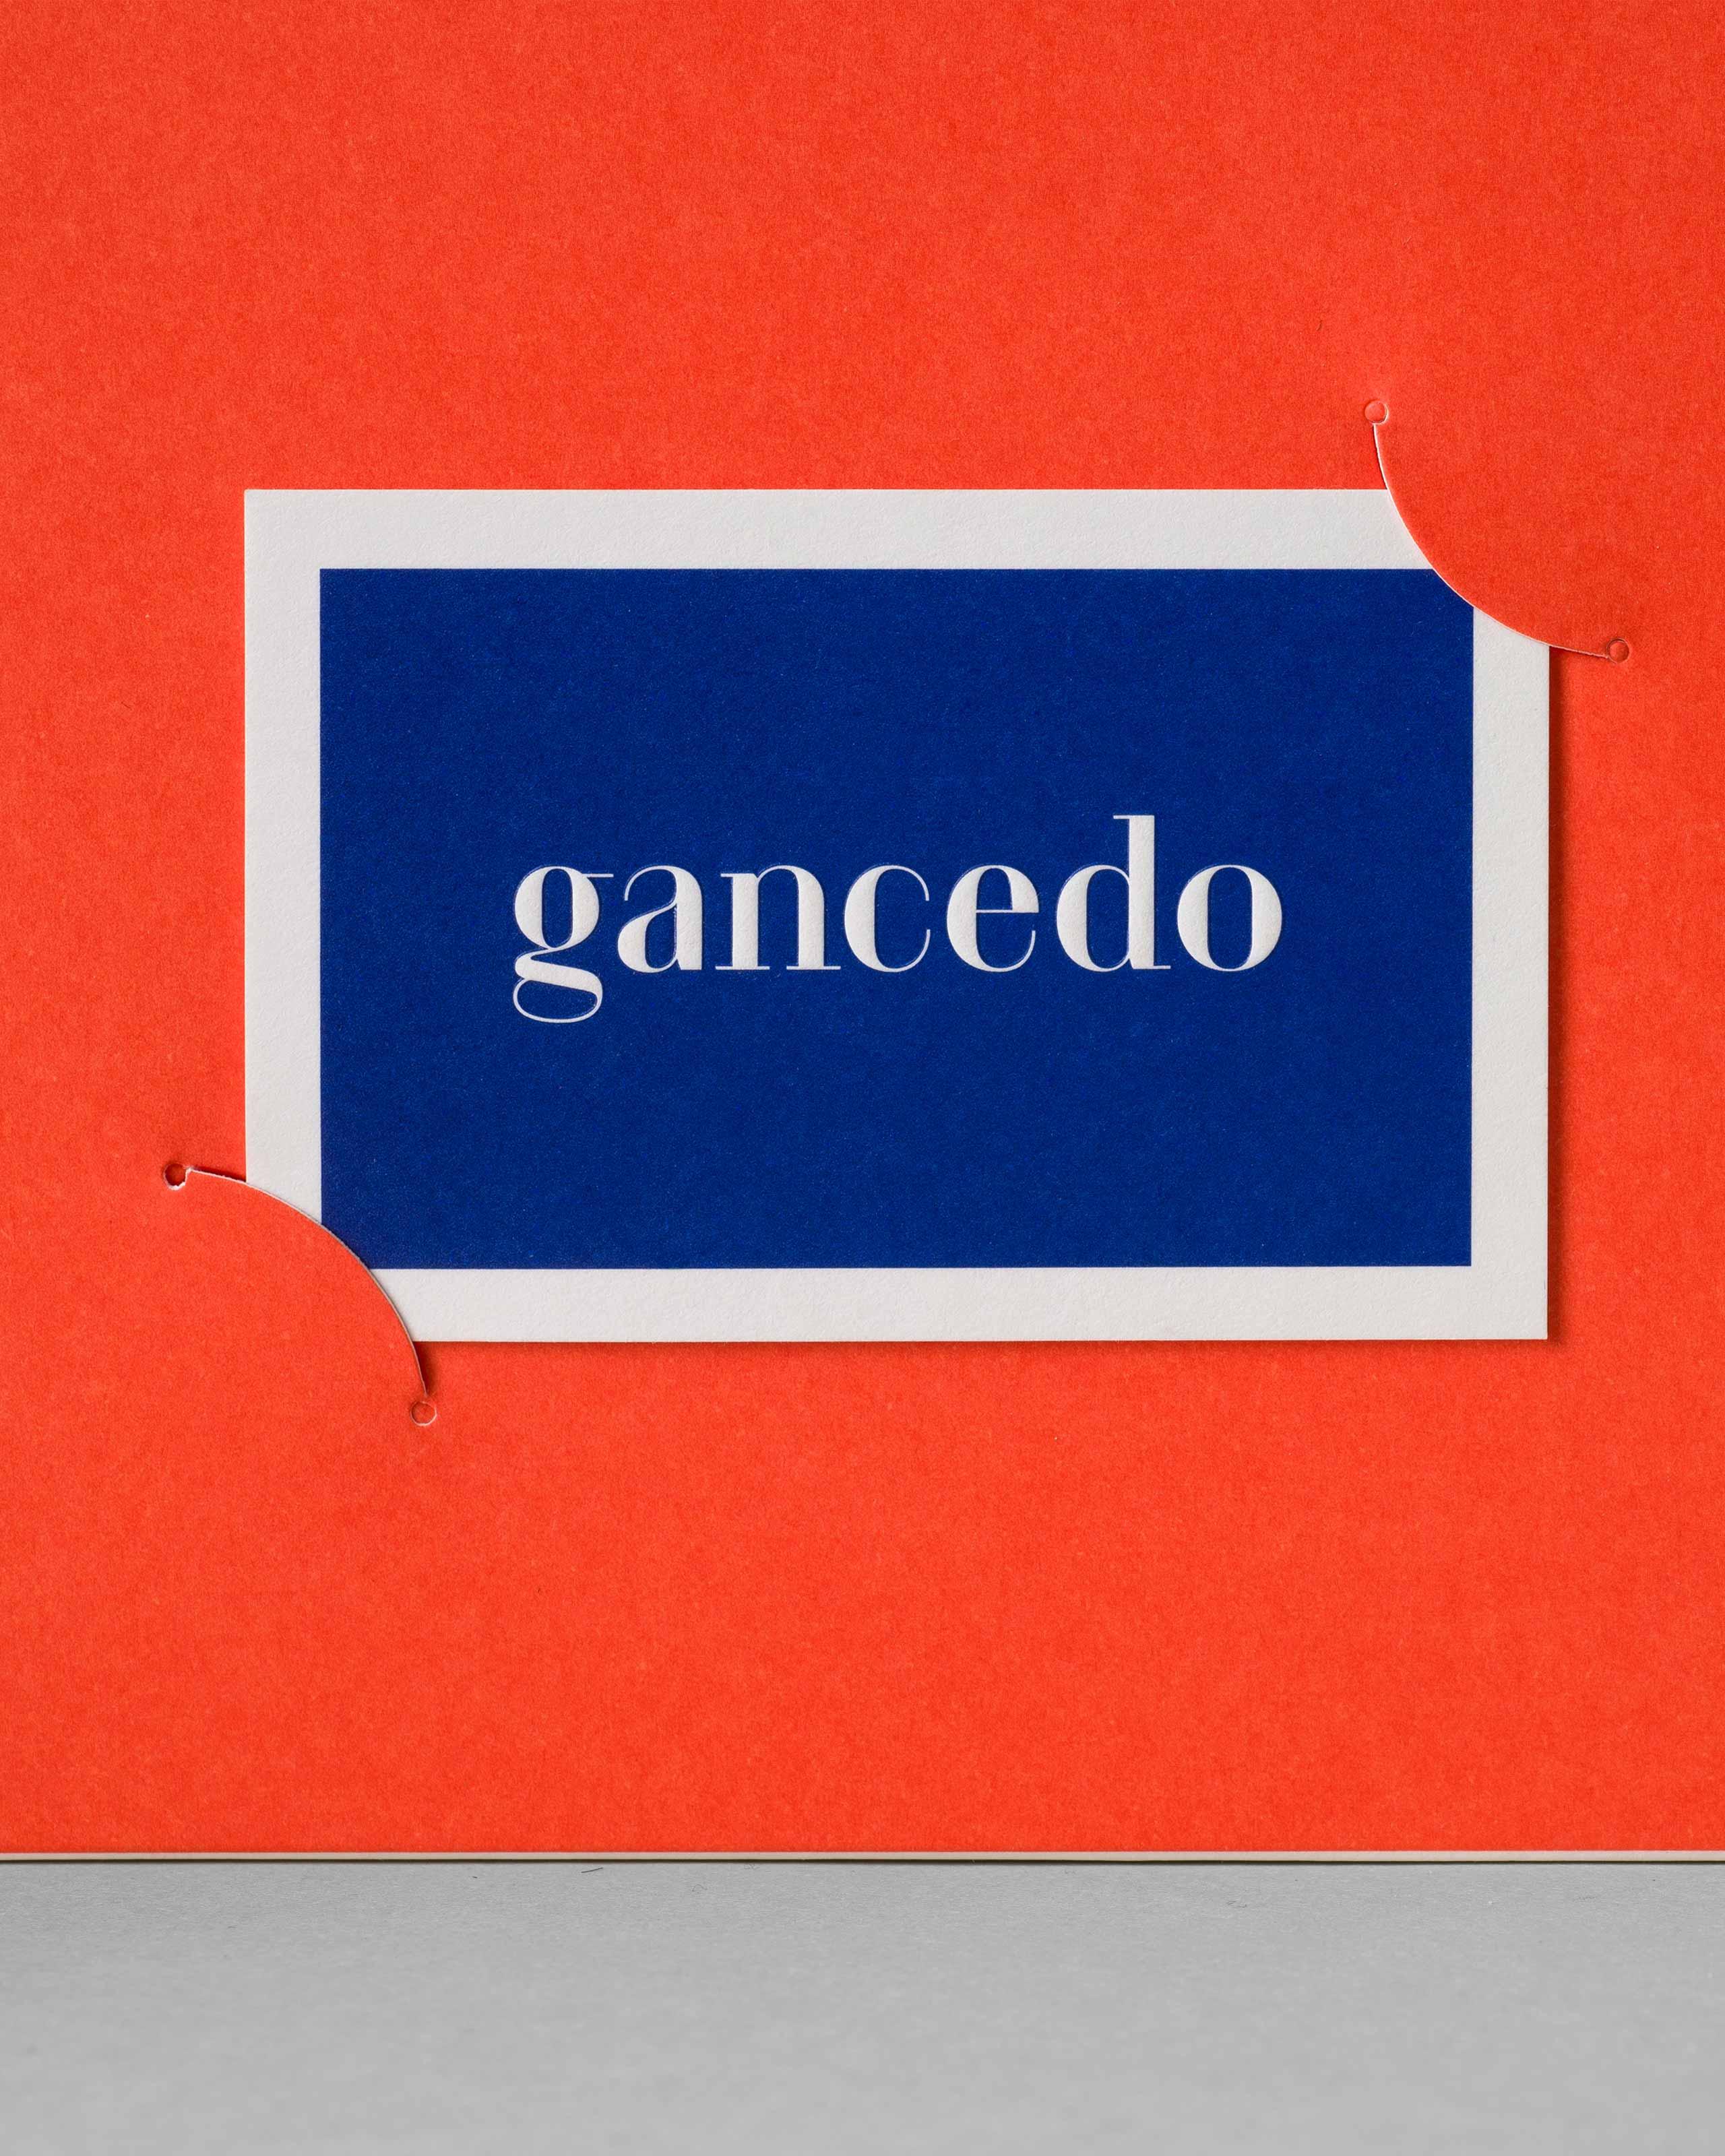 Gancedo 1945